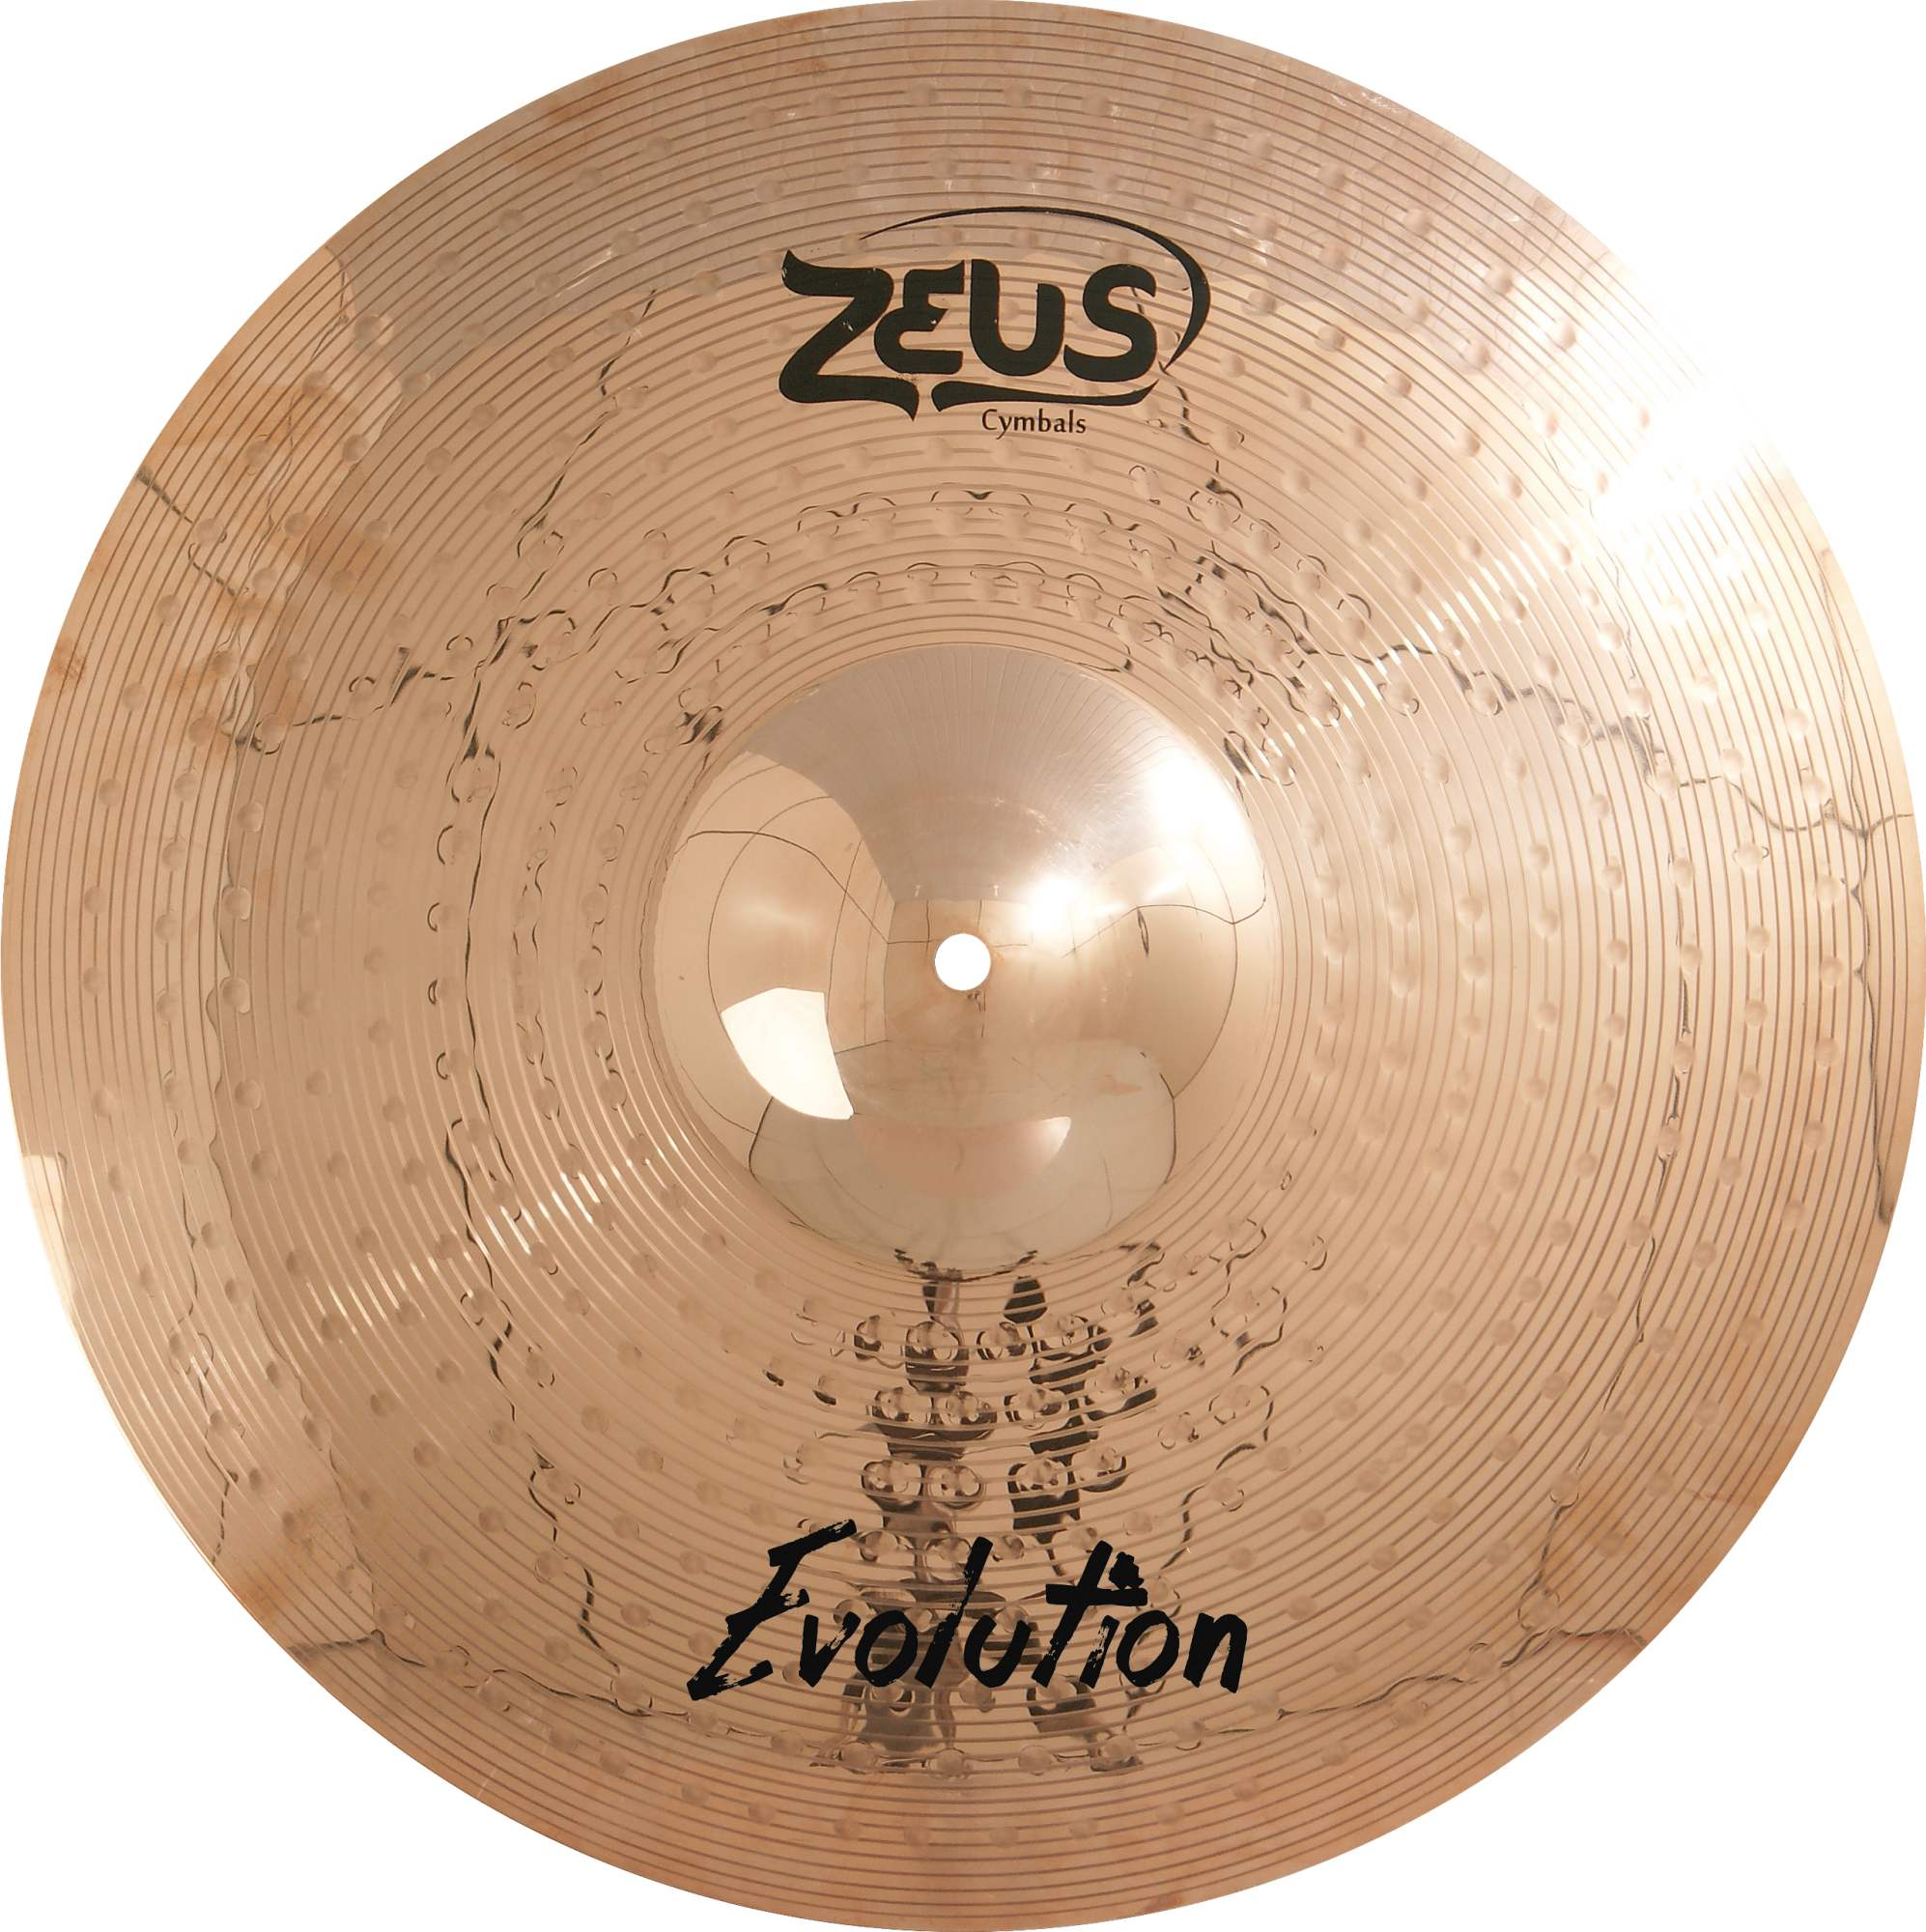 Prato Zeus Evolution Ride 20 Zevr20